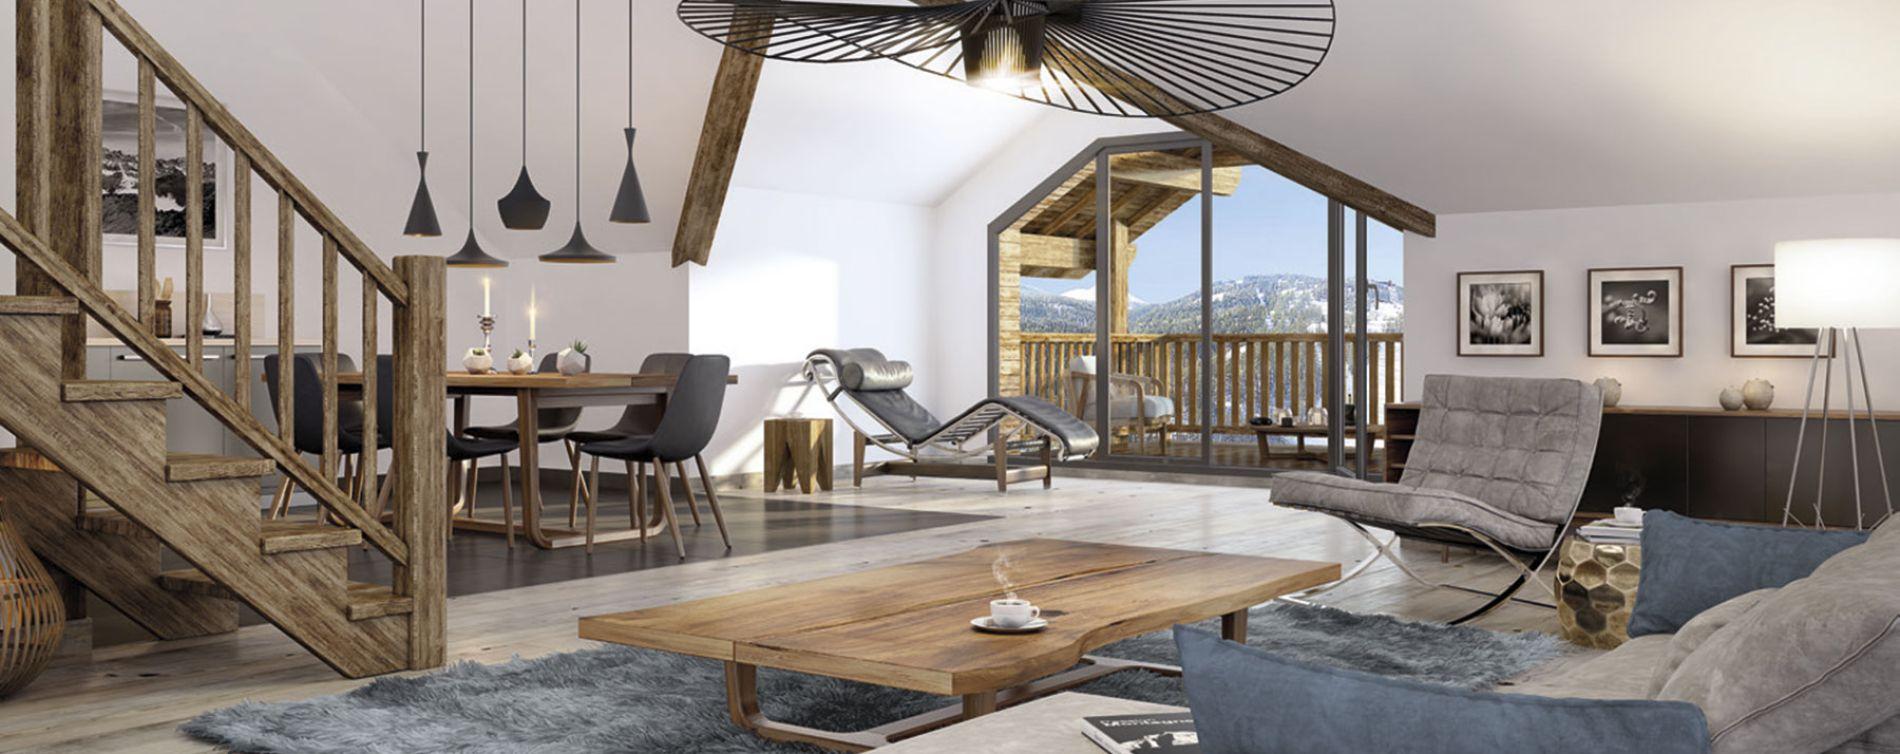 Saint-Chaffrey : programme immobilier neuve « Kalinka » (3)